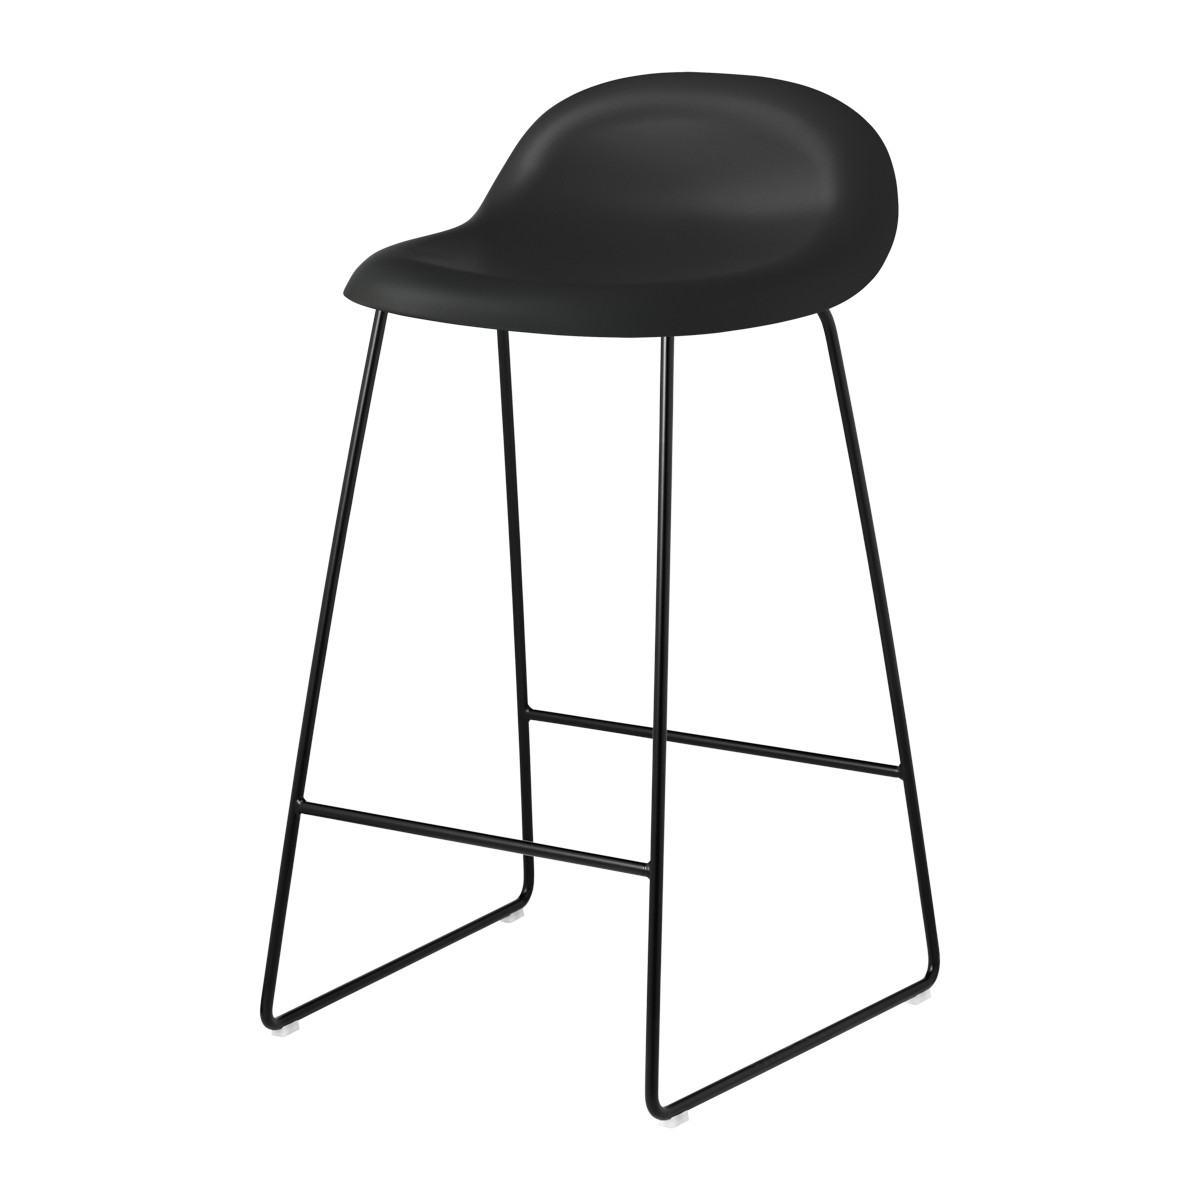 Gubi 3D Counter Stool - Un-Upholstered, 65, Sledge Base